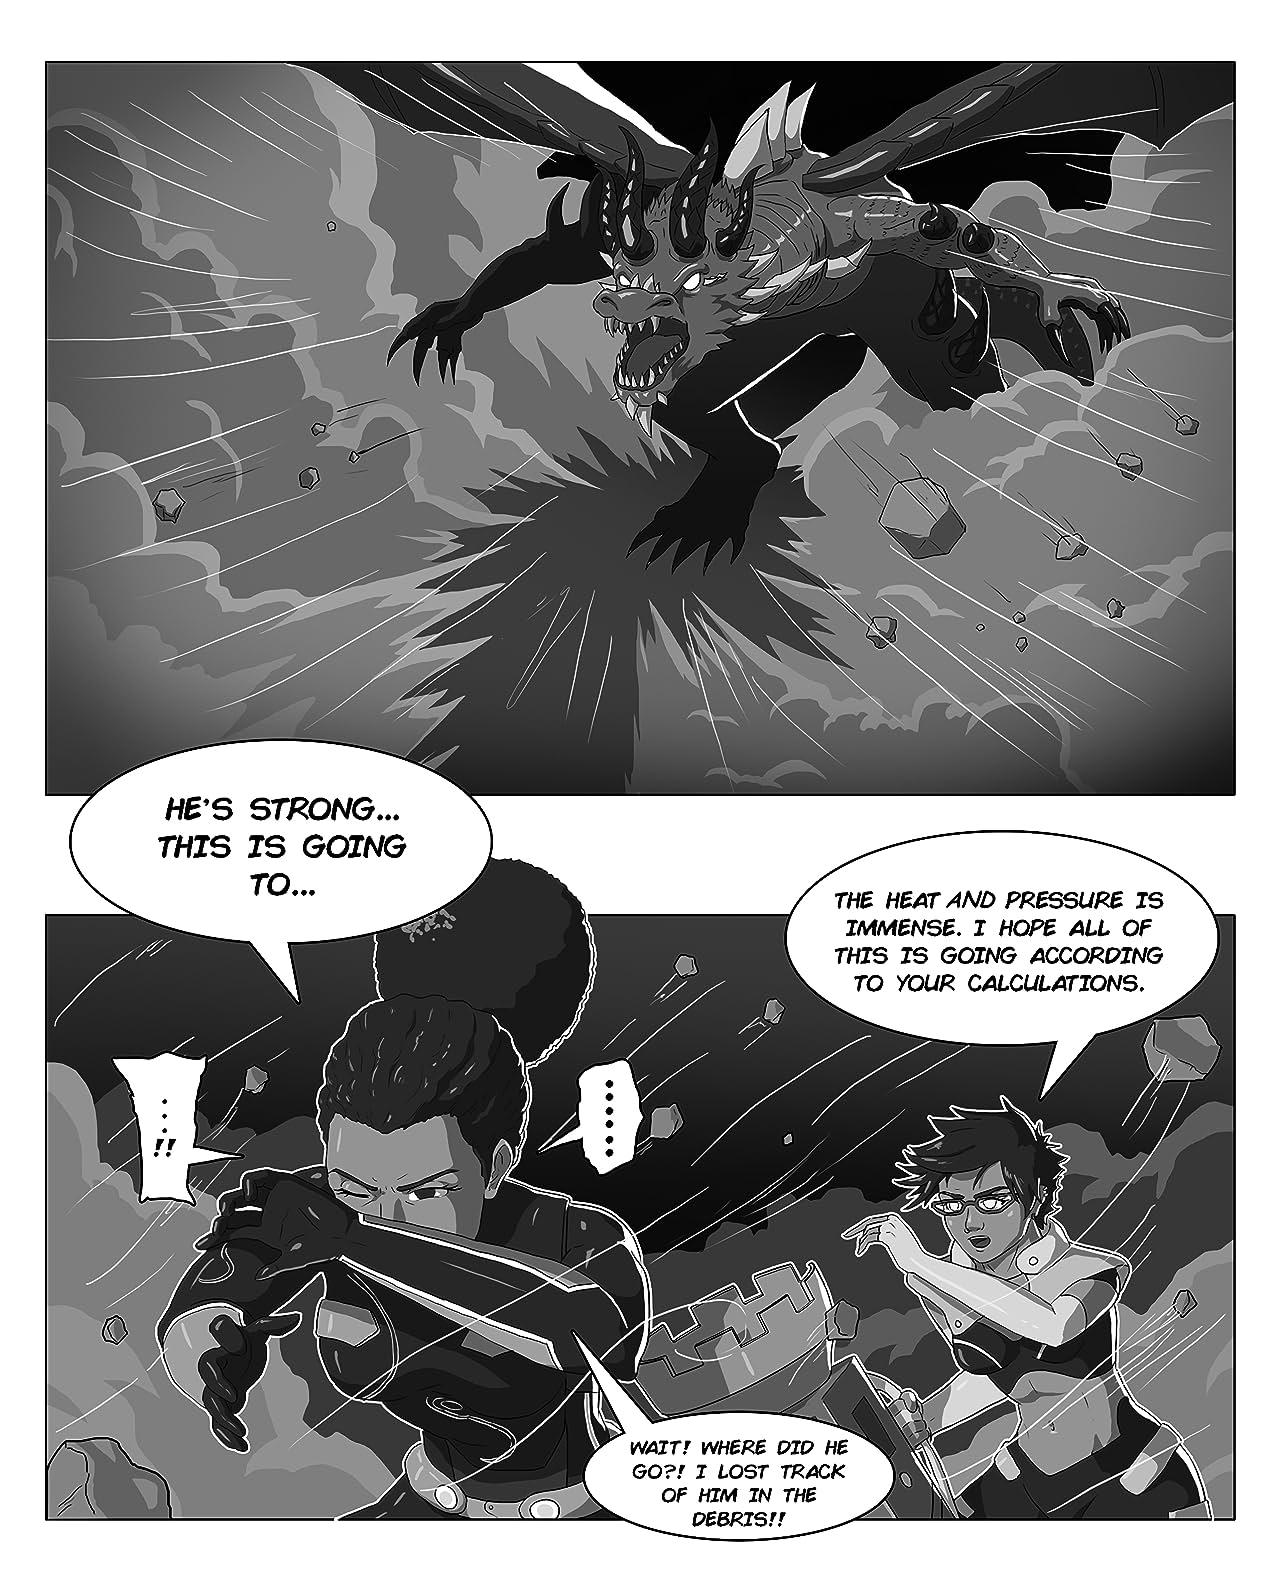 Evian Rising Vol. 2: The Dragon's Fang of War